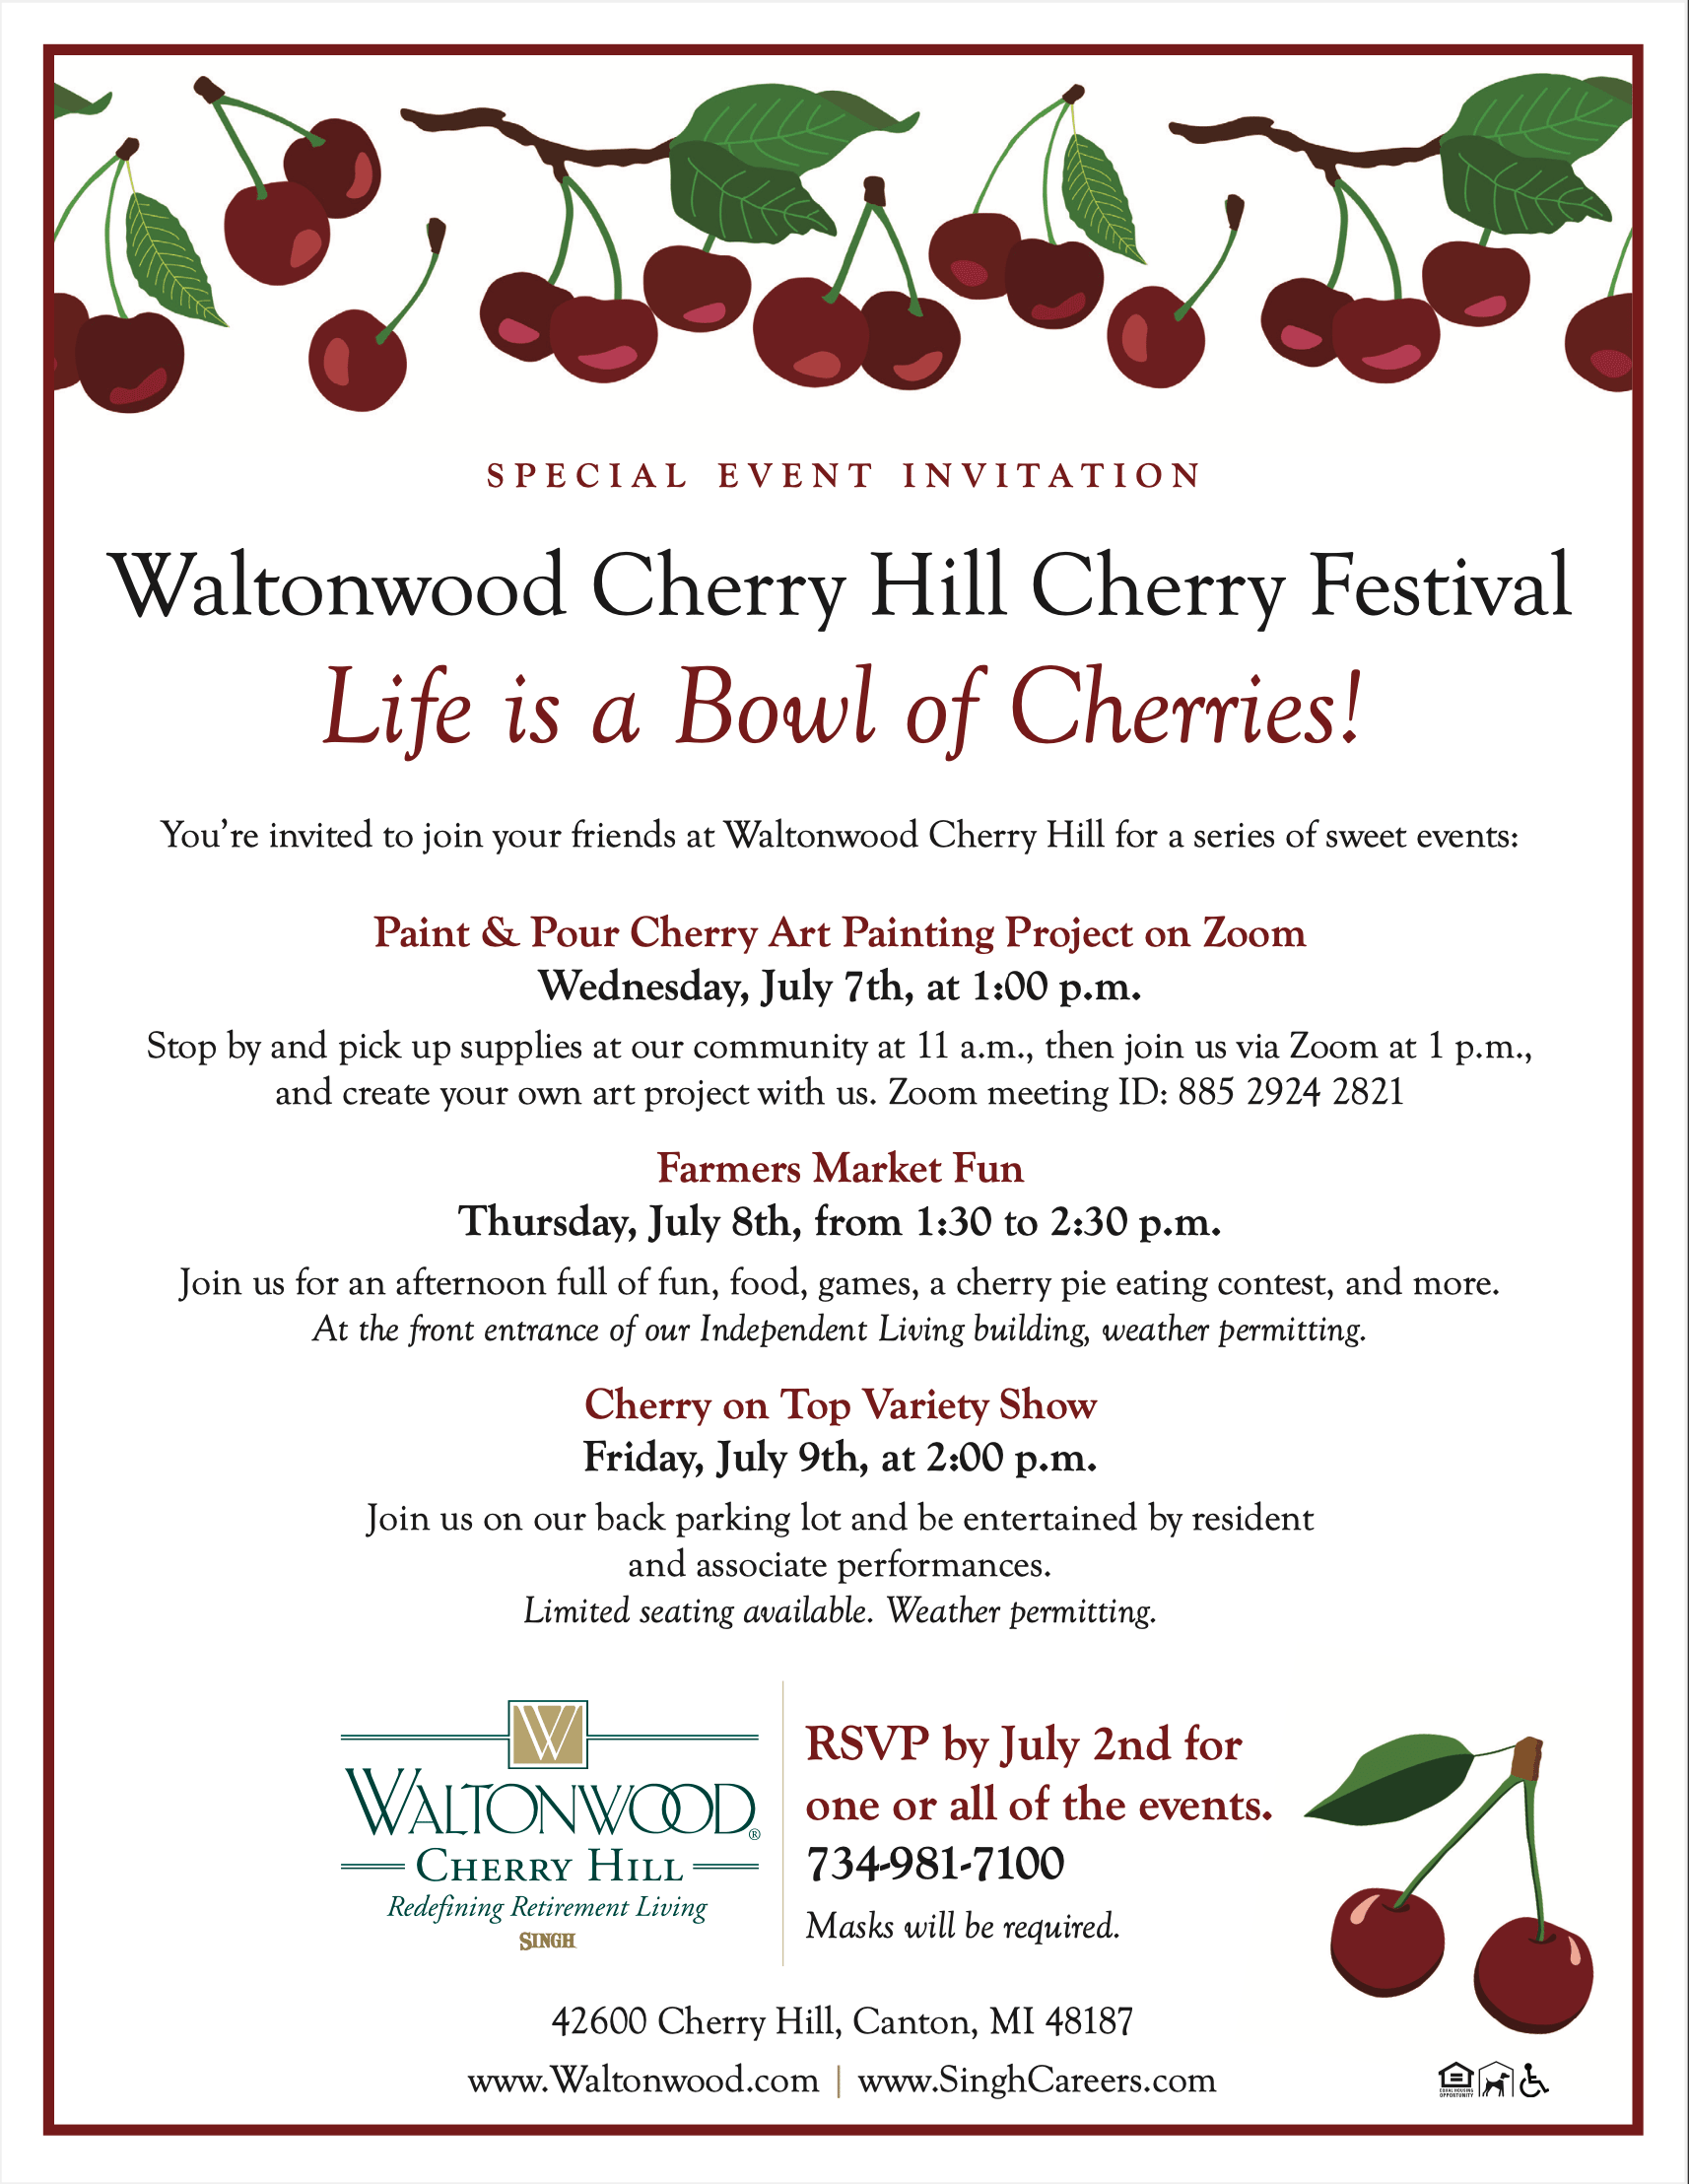 Cherry Hill Cherry Festival Flyer - July 7-9